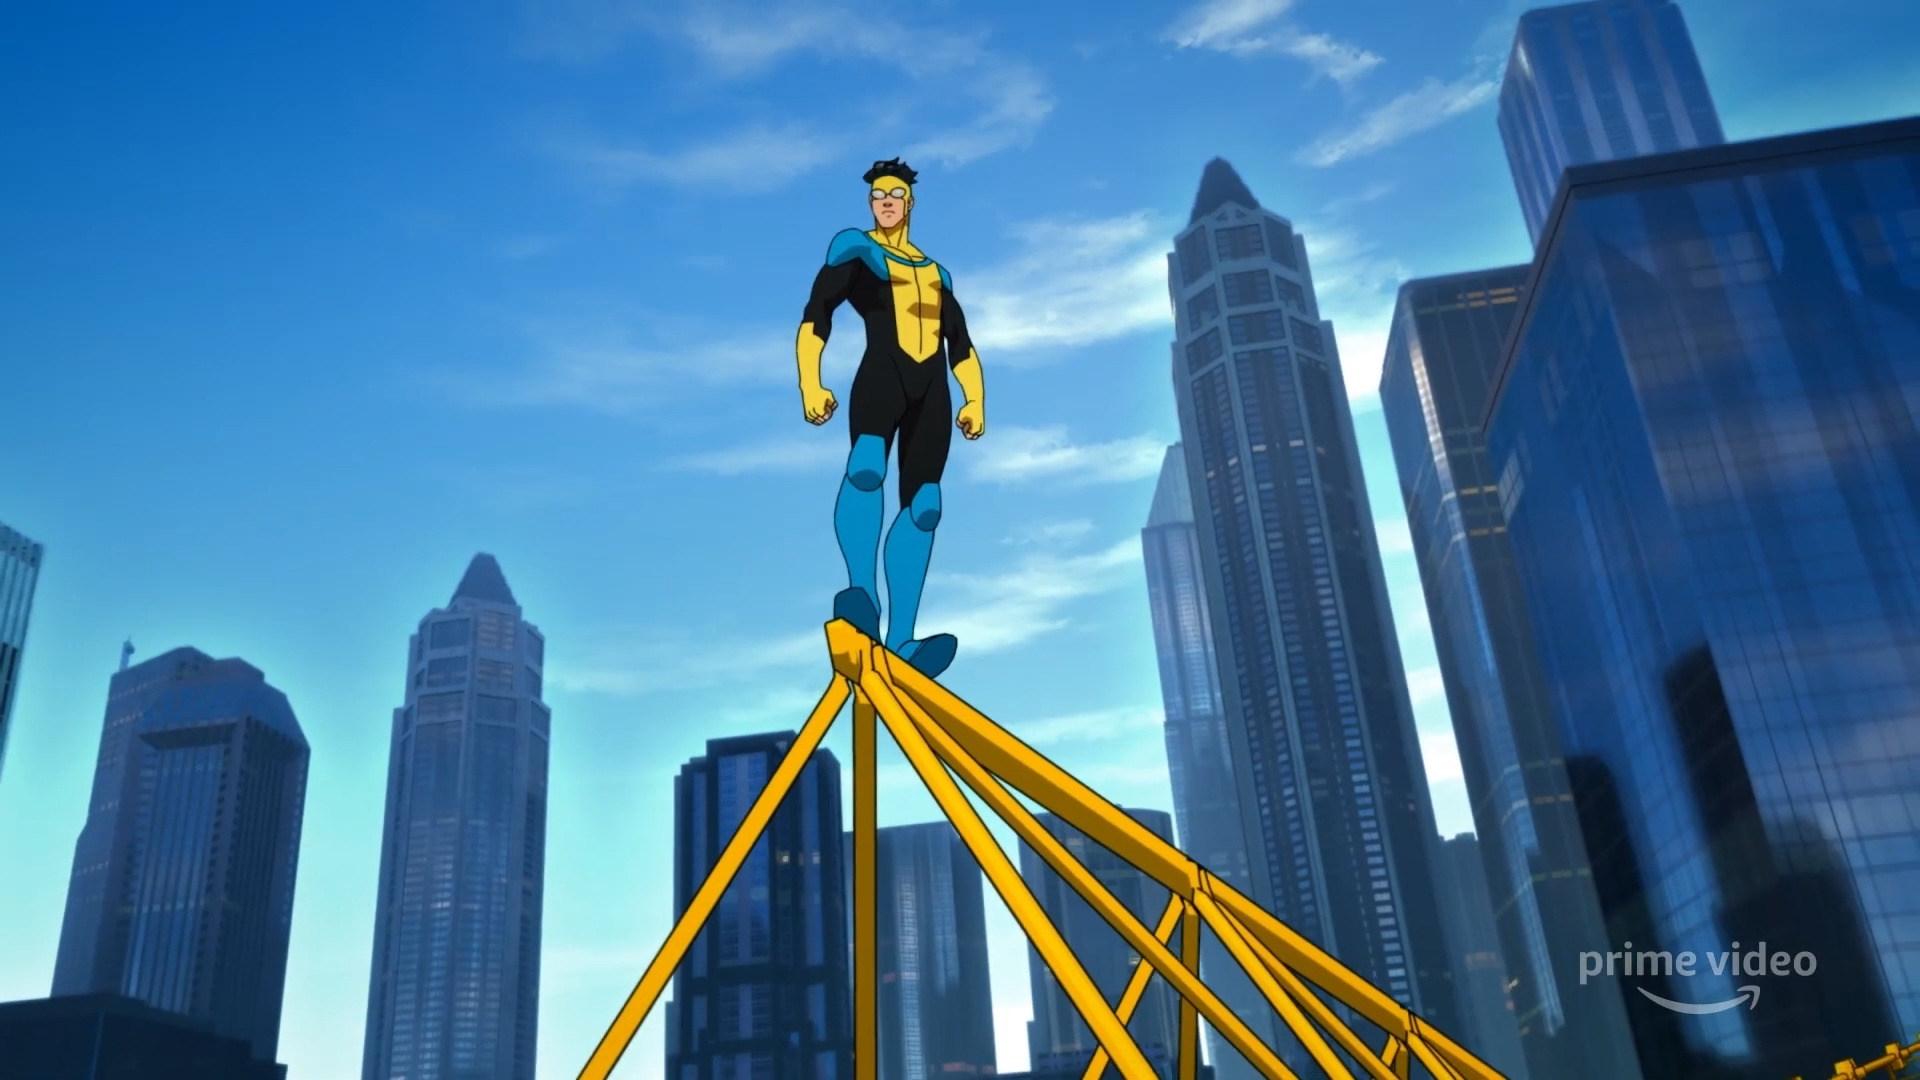 Trailer, Amazon, Serie, Amazon Prime, Amazon Prime Video, Prime Video, Superheld, Superhelden, Animationsserie, Invincible